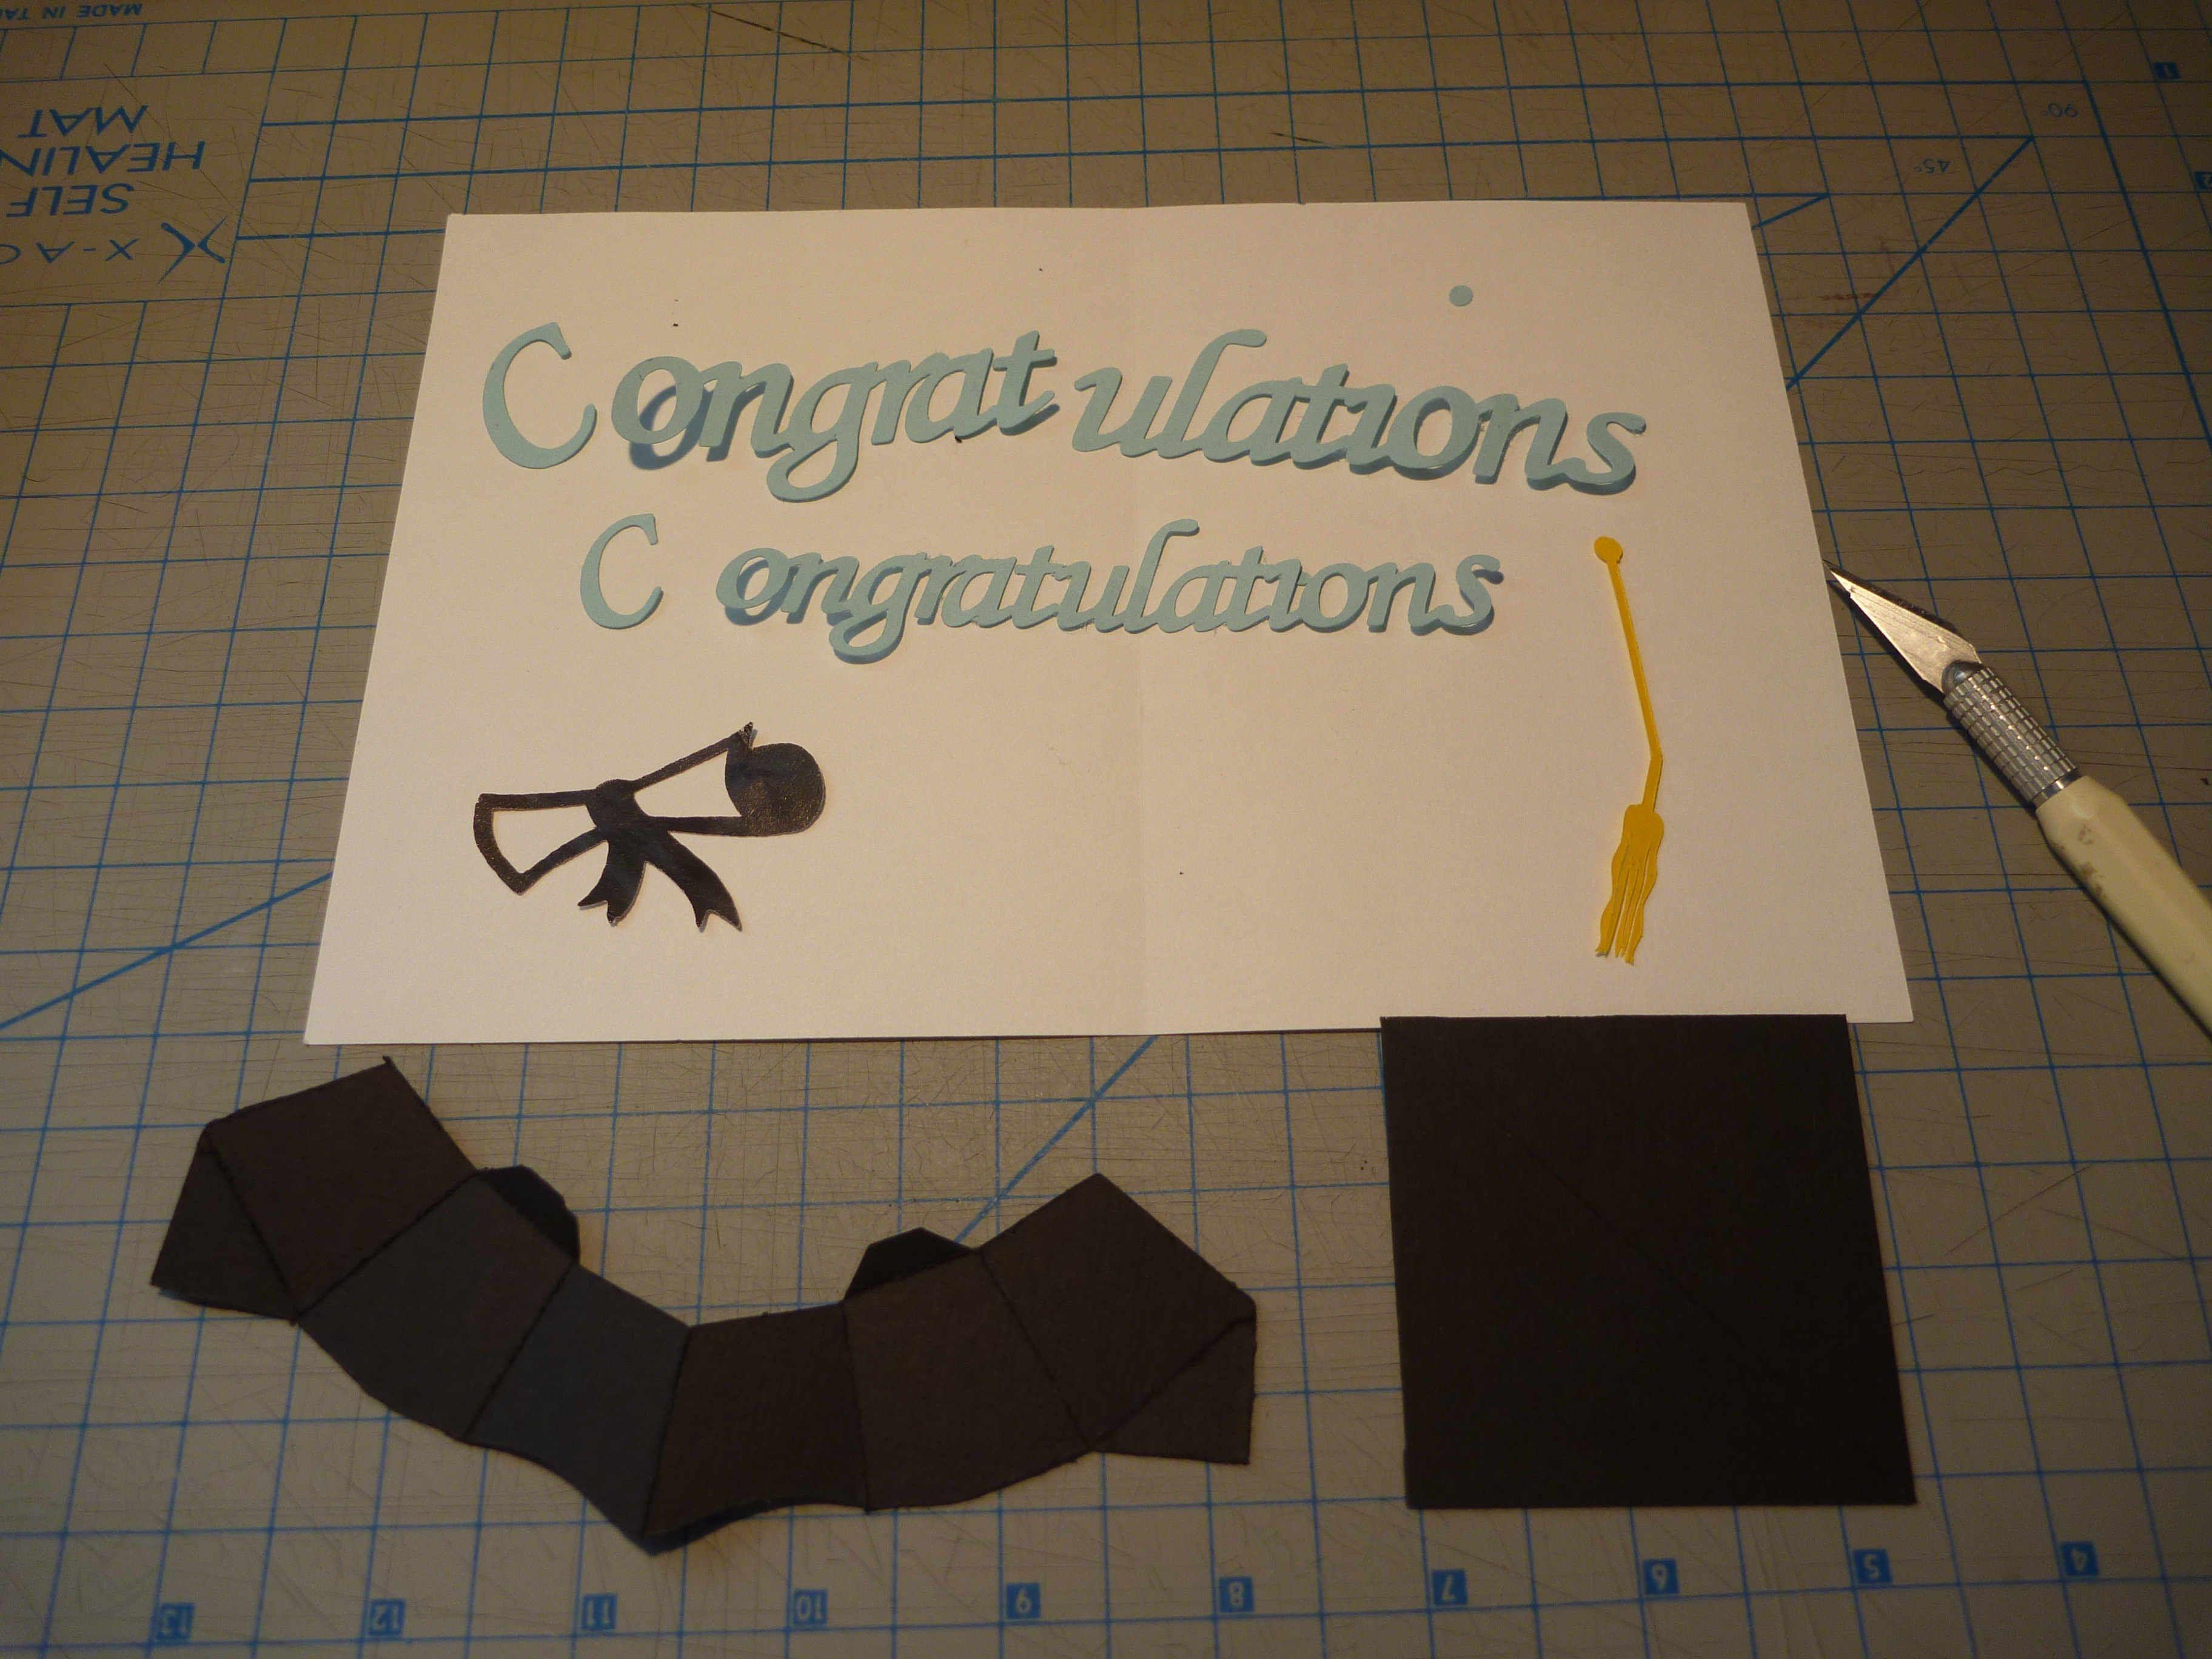 Graduation Pop Up Card 3d Cap Tutorial Creative Pop Up Cards For Graduation Pop Up Card Template Cumed Or Pop Up Cards Pop Up Card Templates Card Template